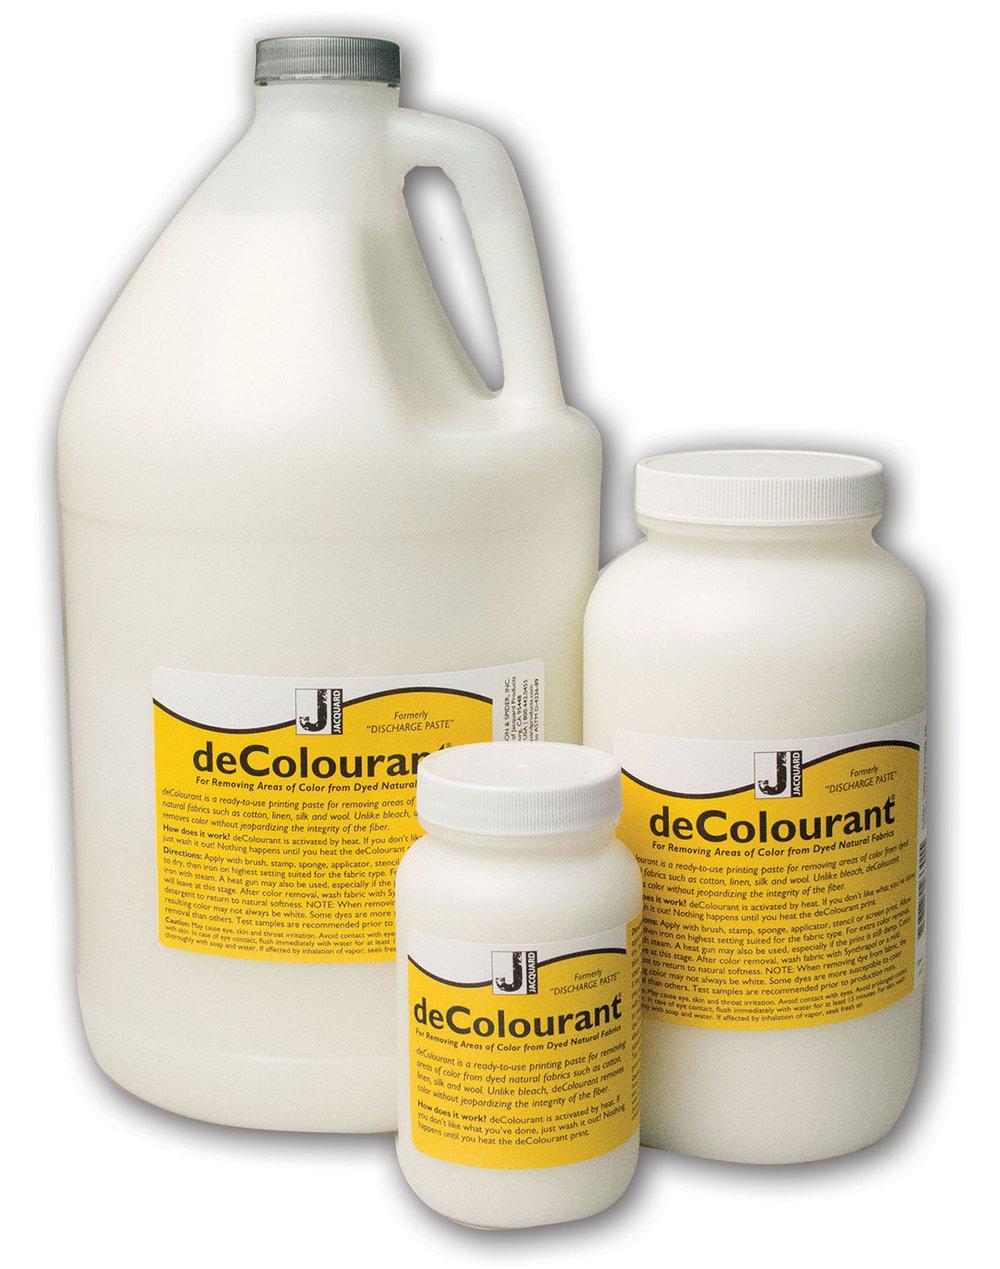 deColourant_3-sizes-RGB.jpg